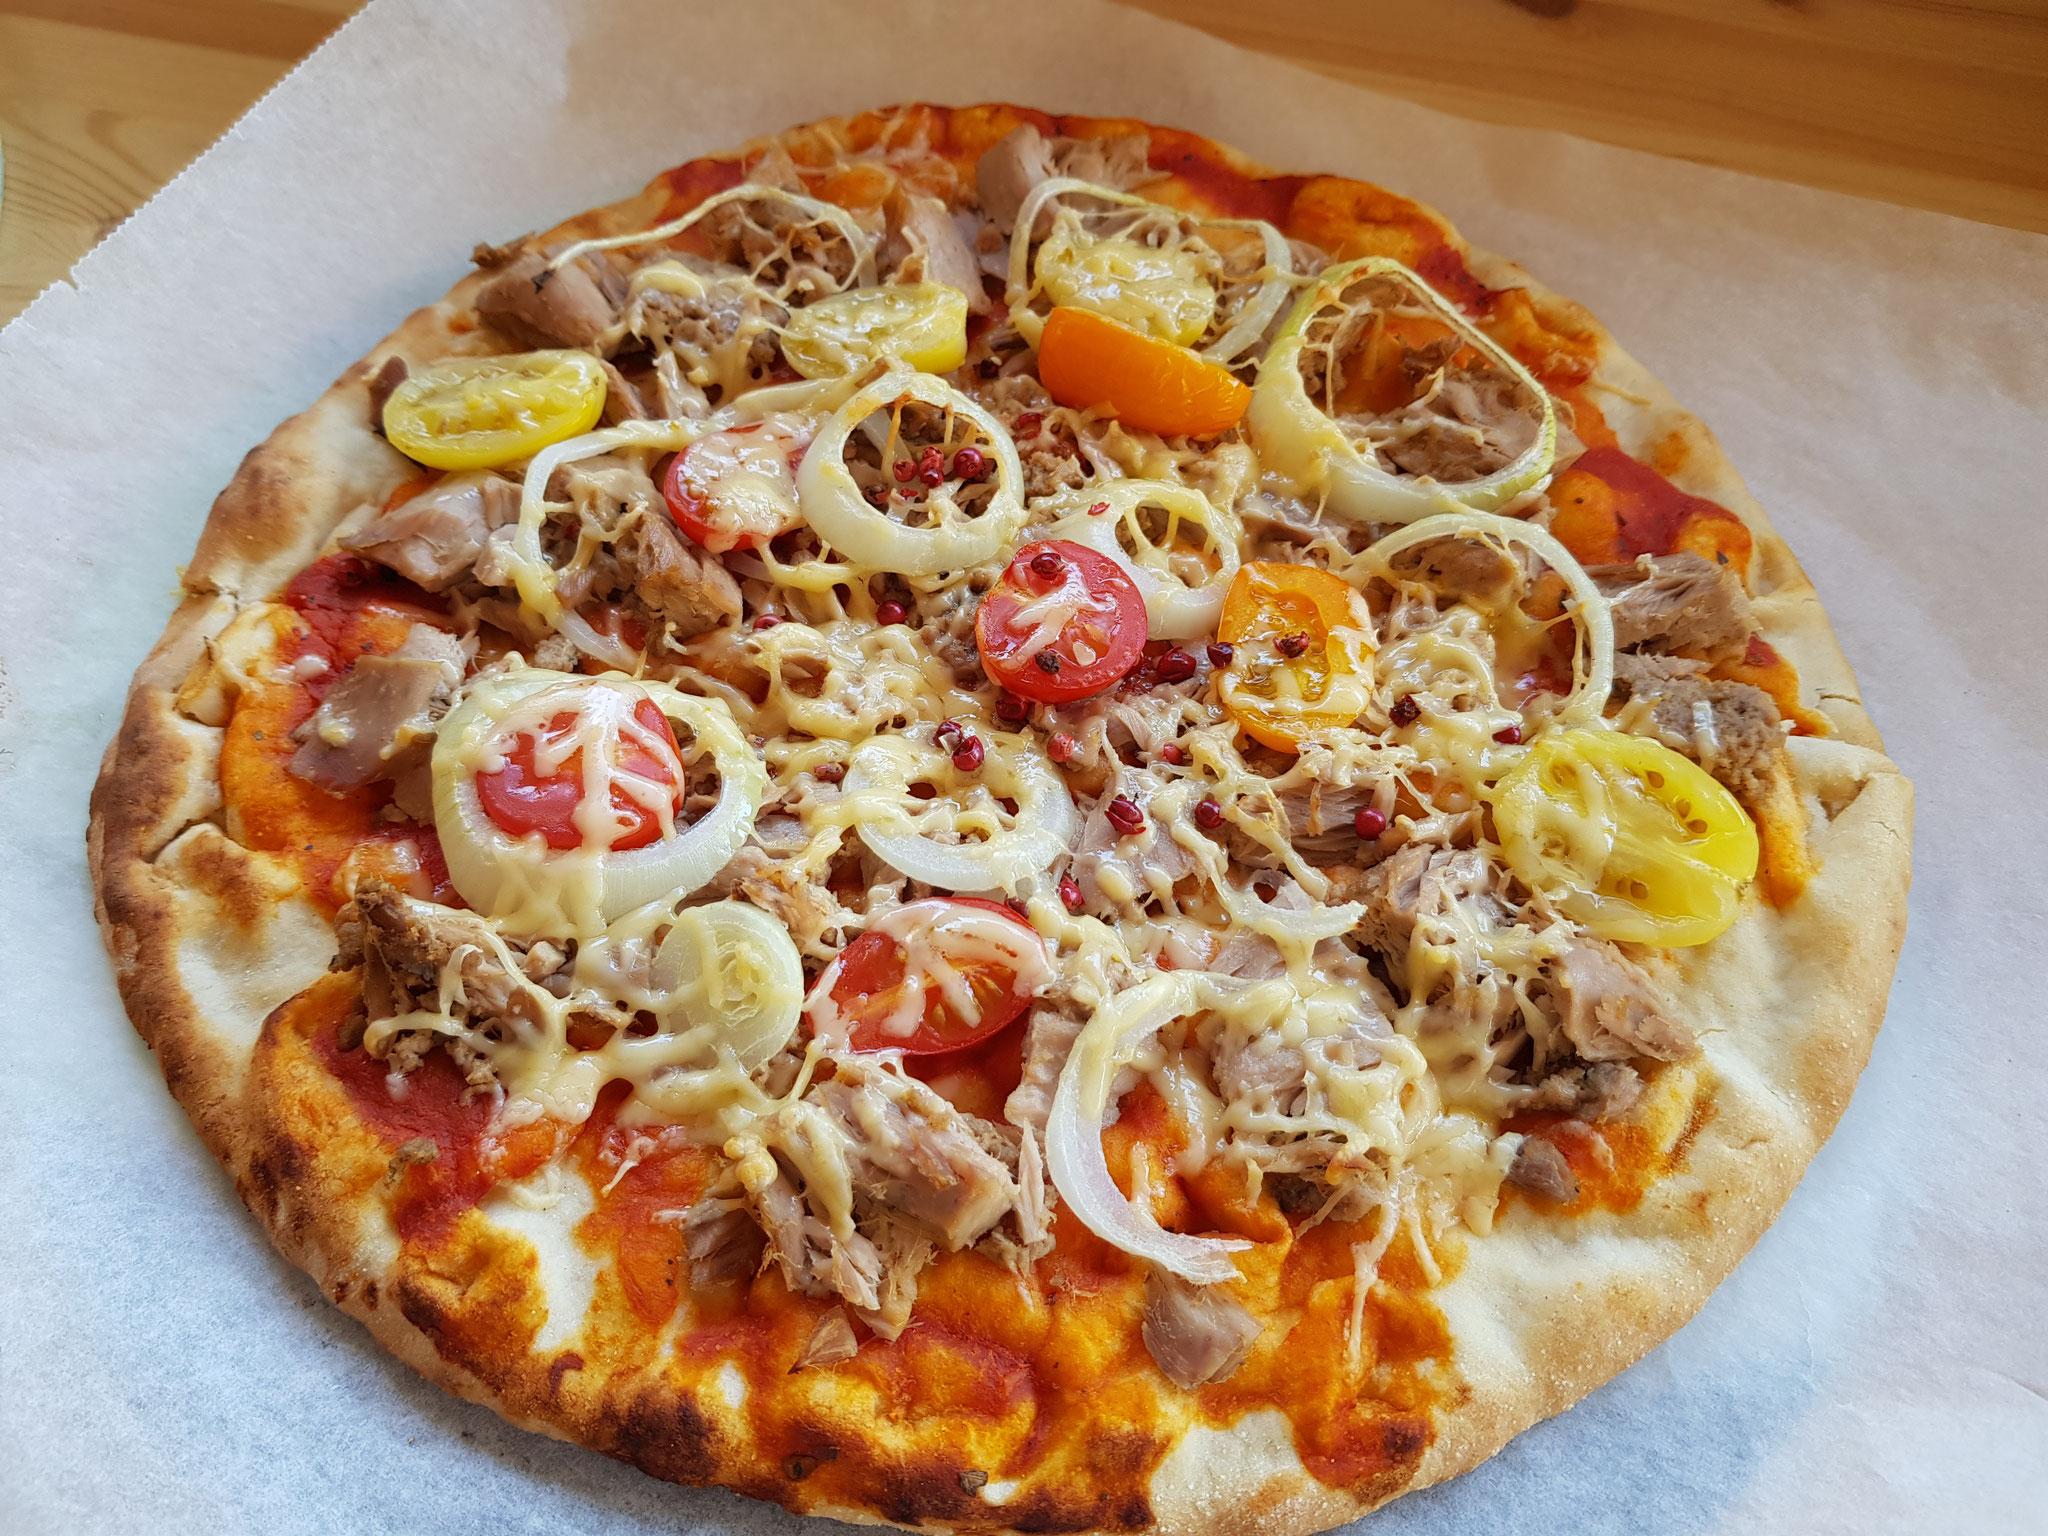 Tonijn pizza